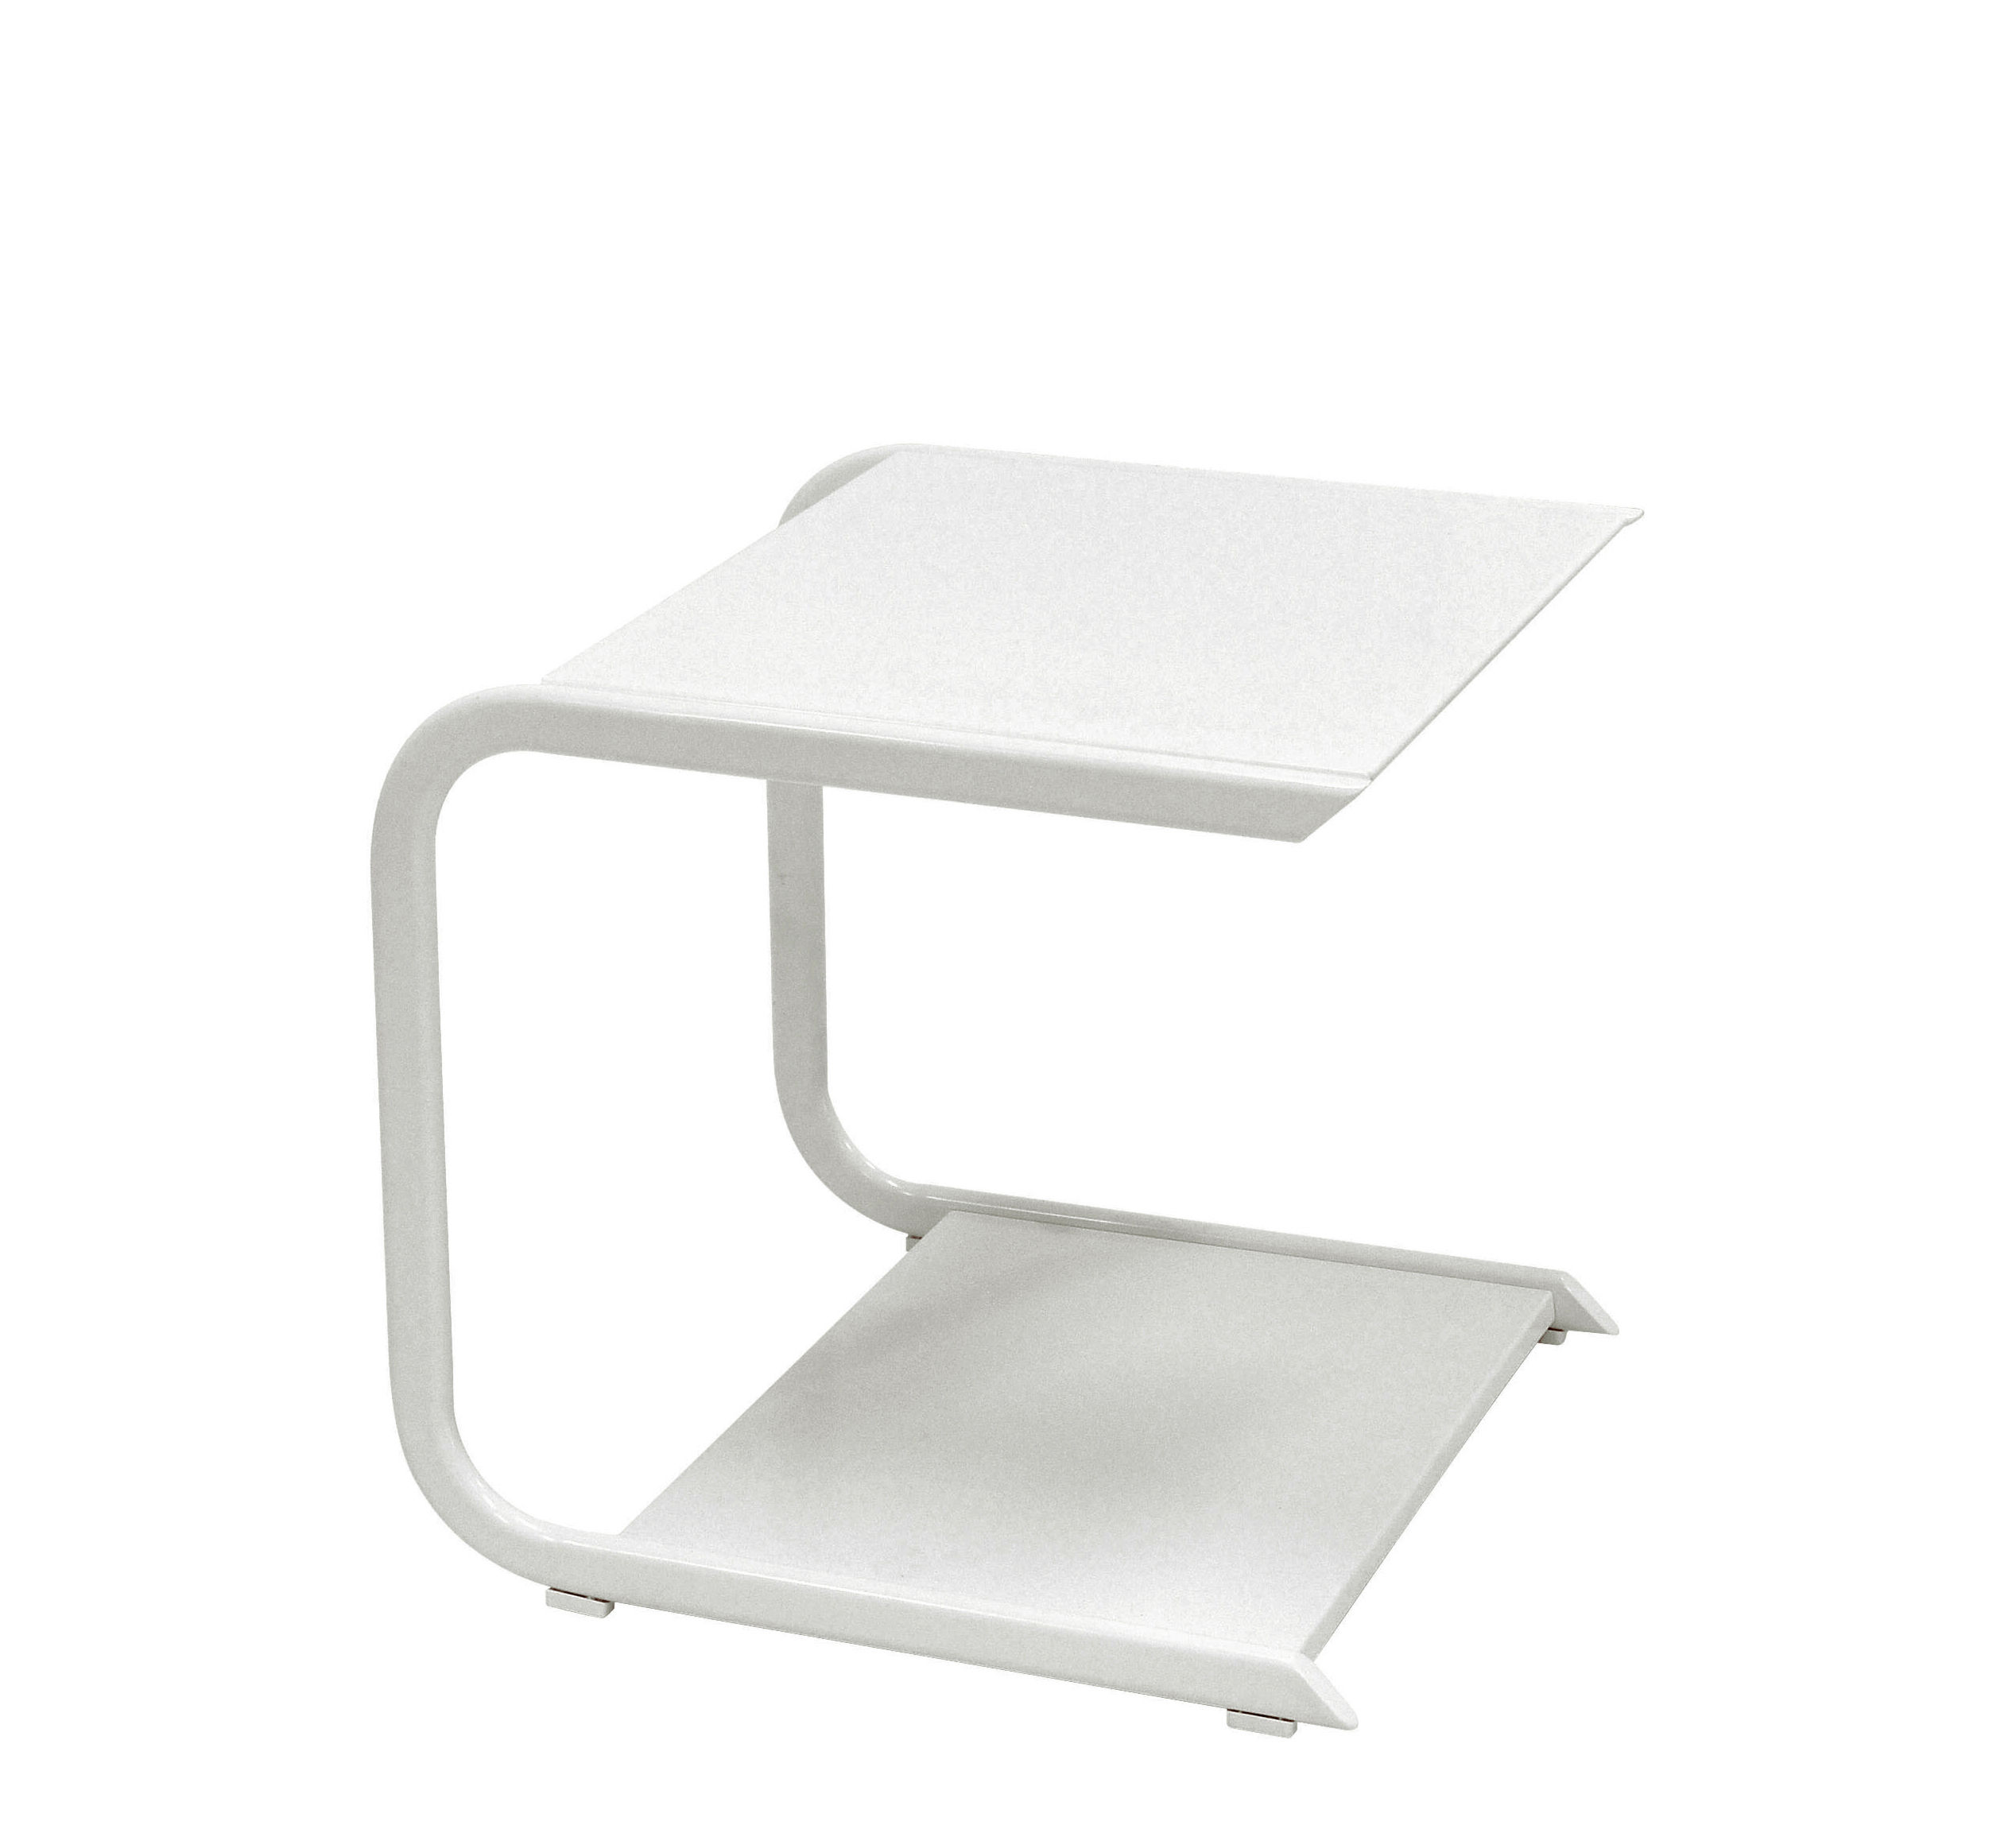 Mobilier - Tables basses - Table basse Holly / L 44 cm - Emu - Blanc - Aluminium verni, Inox